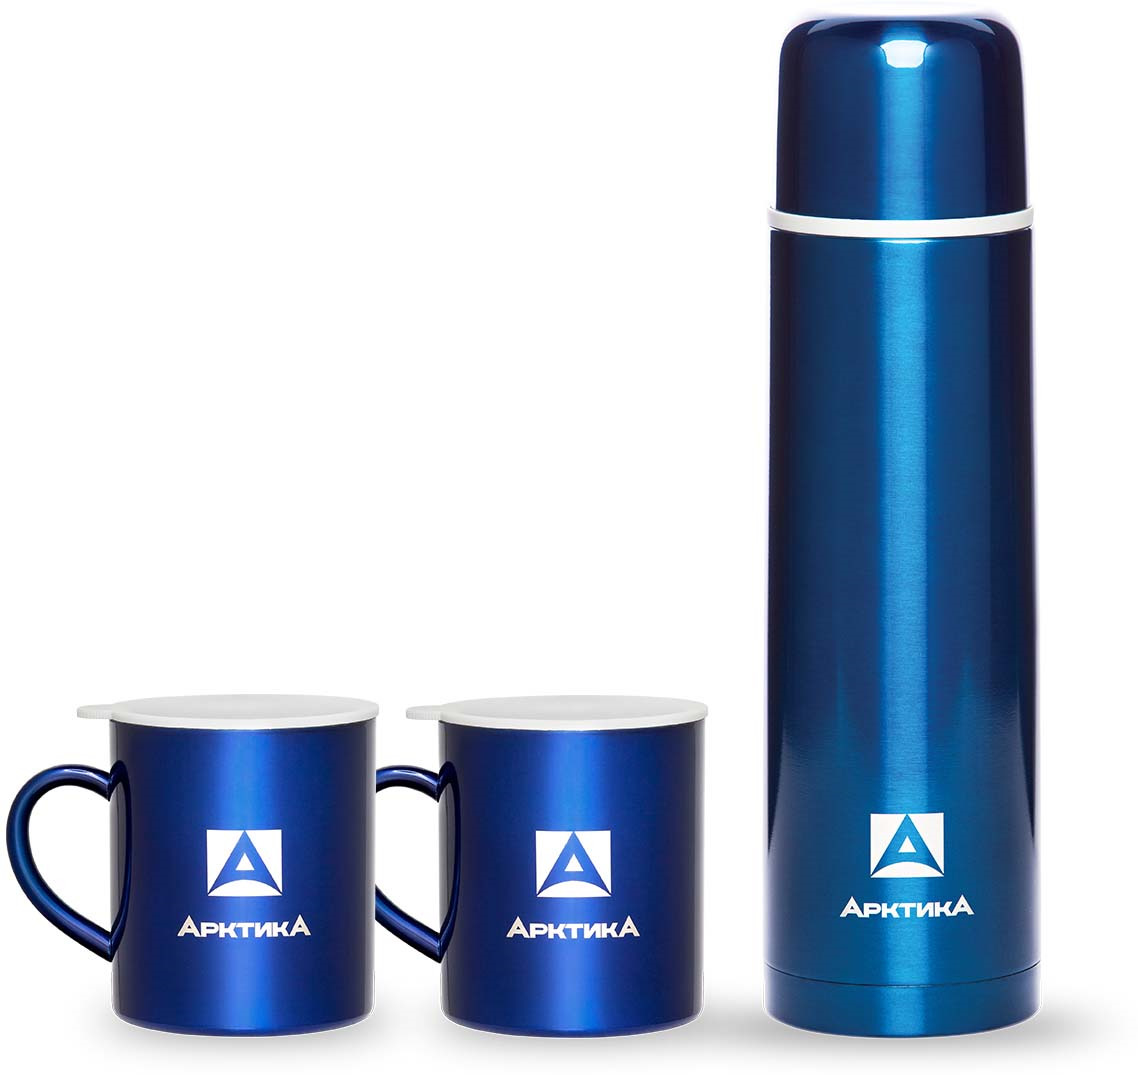 Набор Арктика: термос 1 л, две термокружки с крышкой по 300 мл, цвет: синий, 1 л. 102-1000S